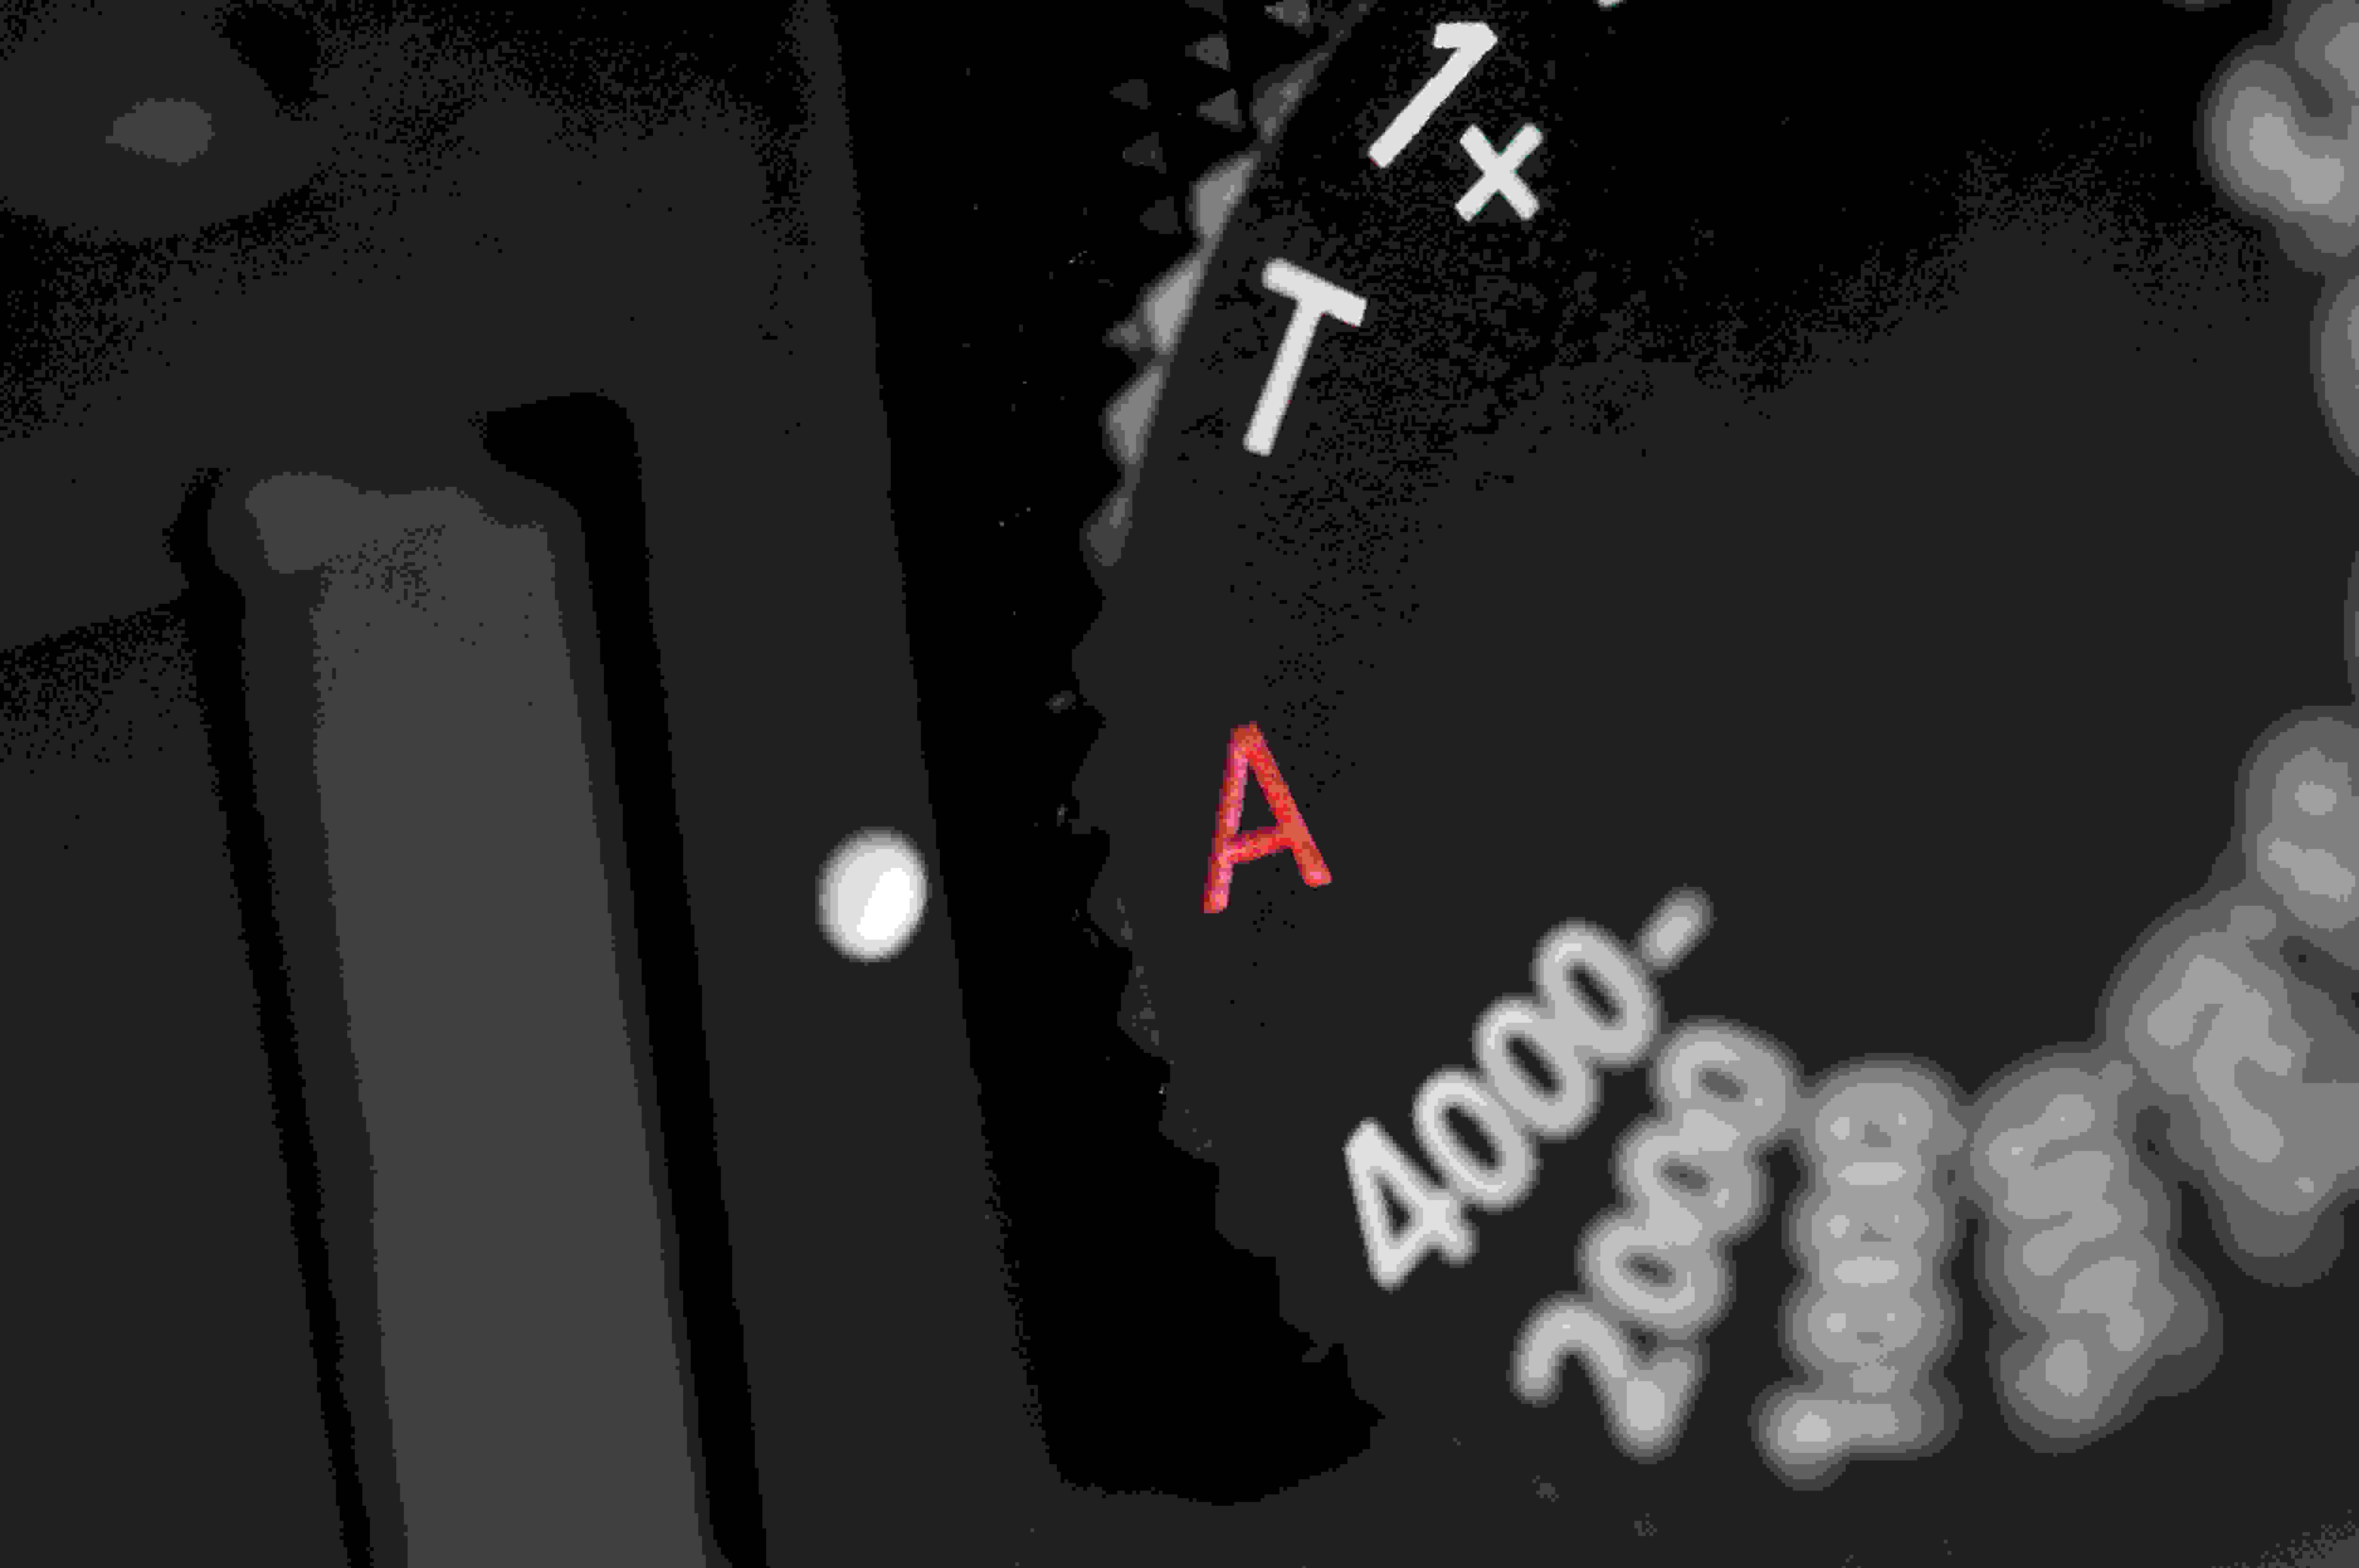 A photograph of the Panasonic Lumix LX100's shutter speed dial.